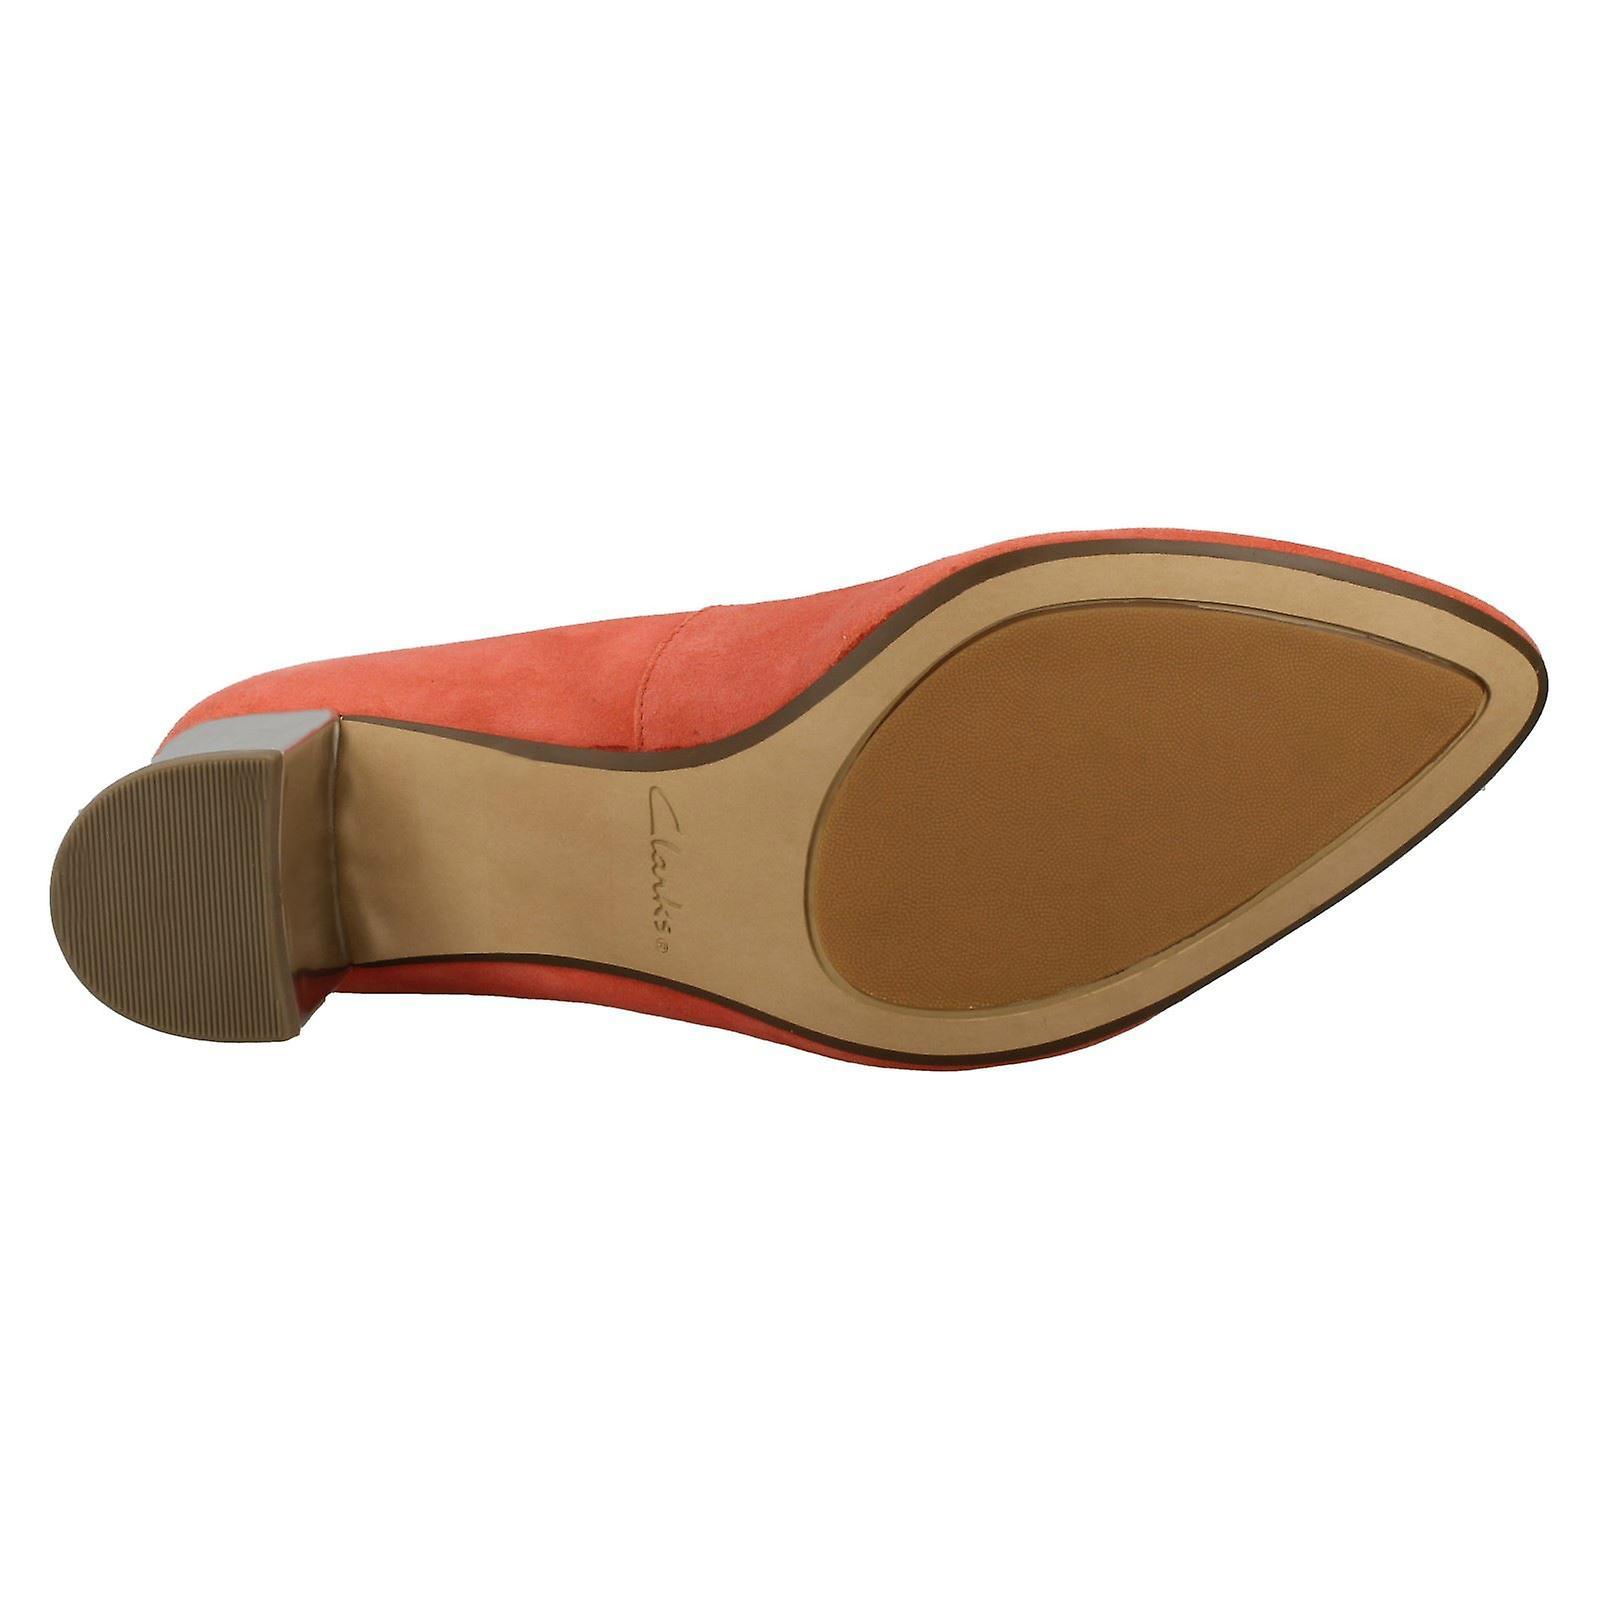 Ladies Clarks Smart Court Shoes Blissful Cloud oTd6n